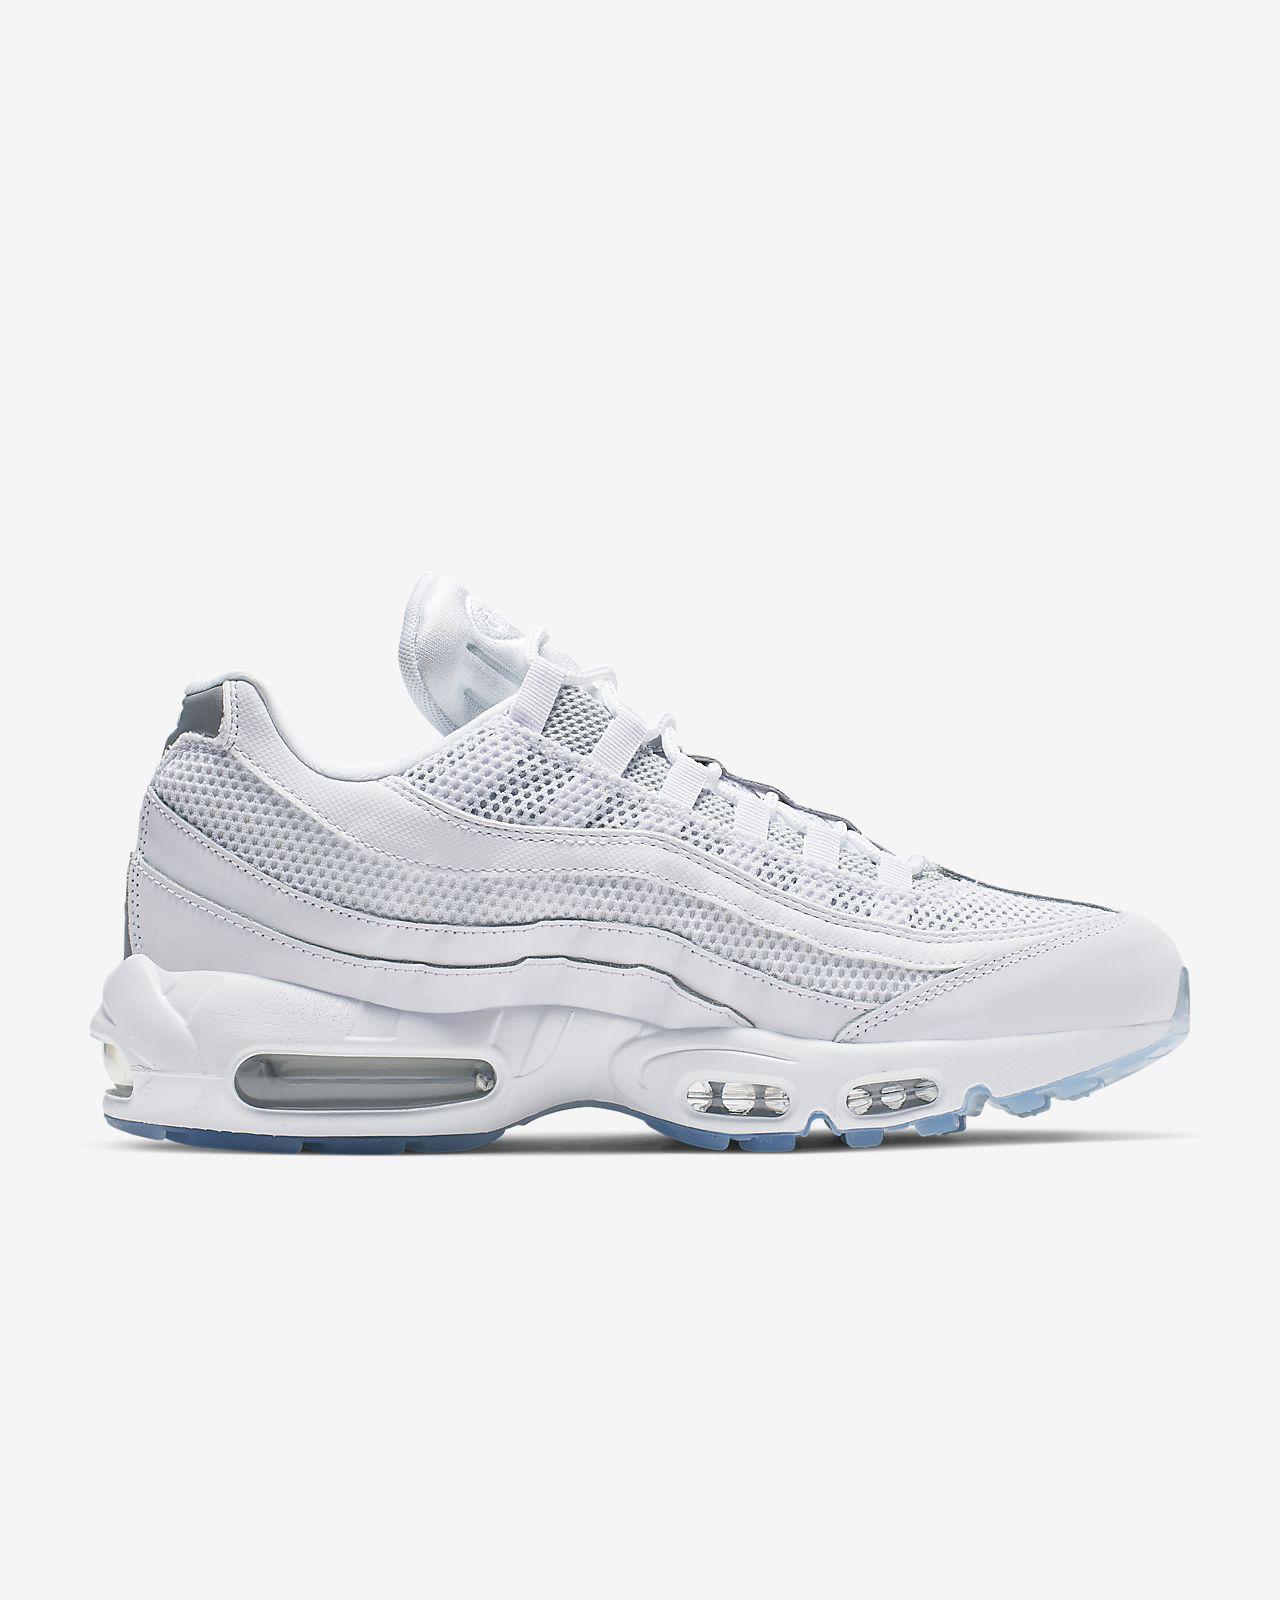 Nike Air Max 95 Men's Running shoes BlackWhite 749766 040